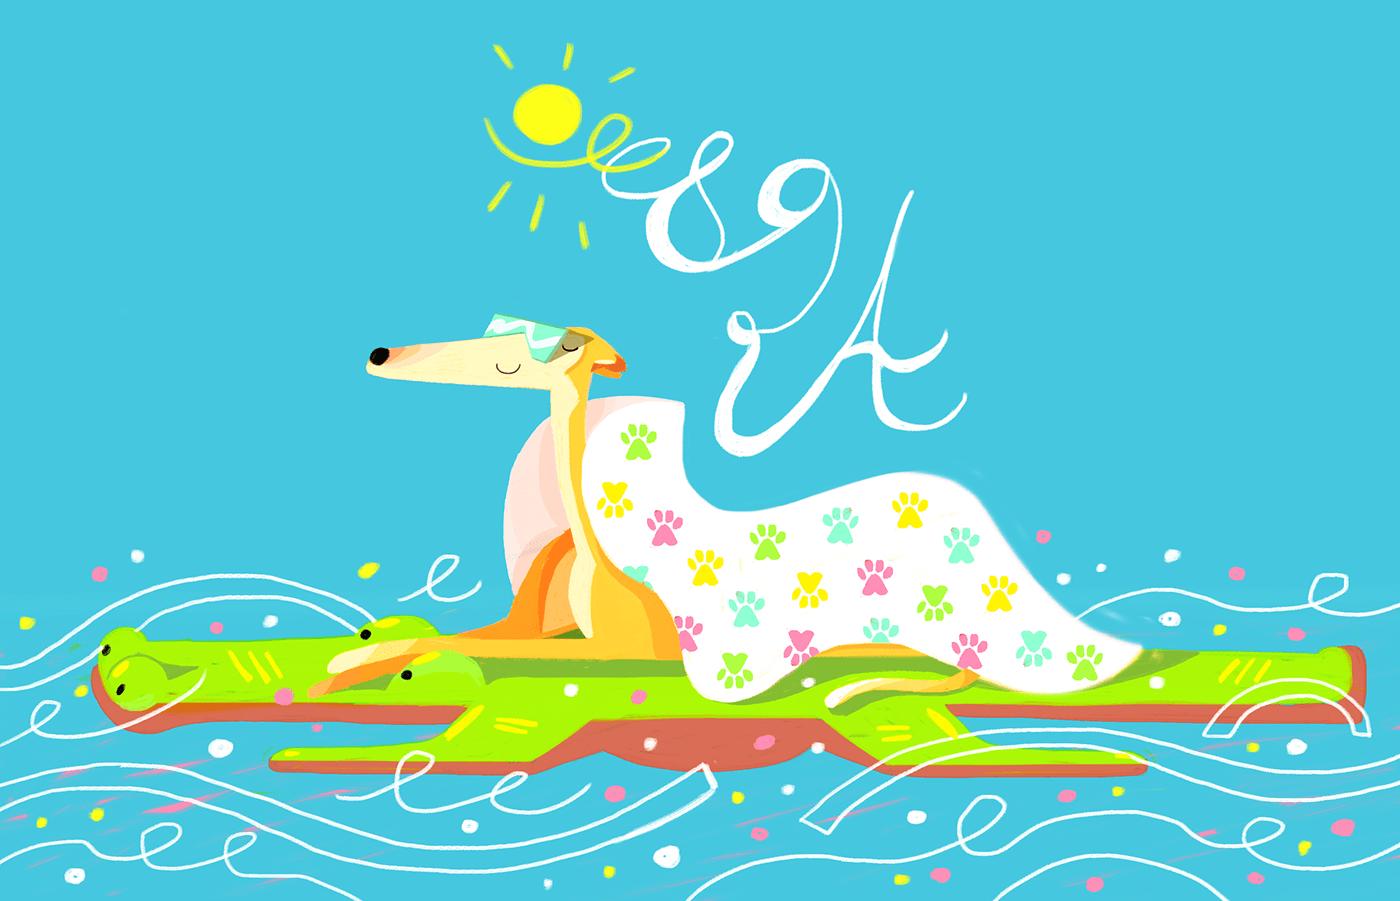 comission digitalart dog ILLUSTRATION